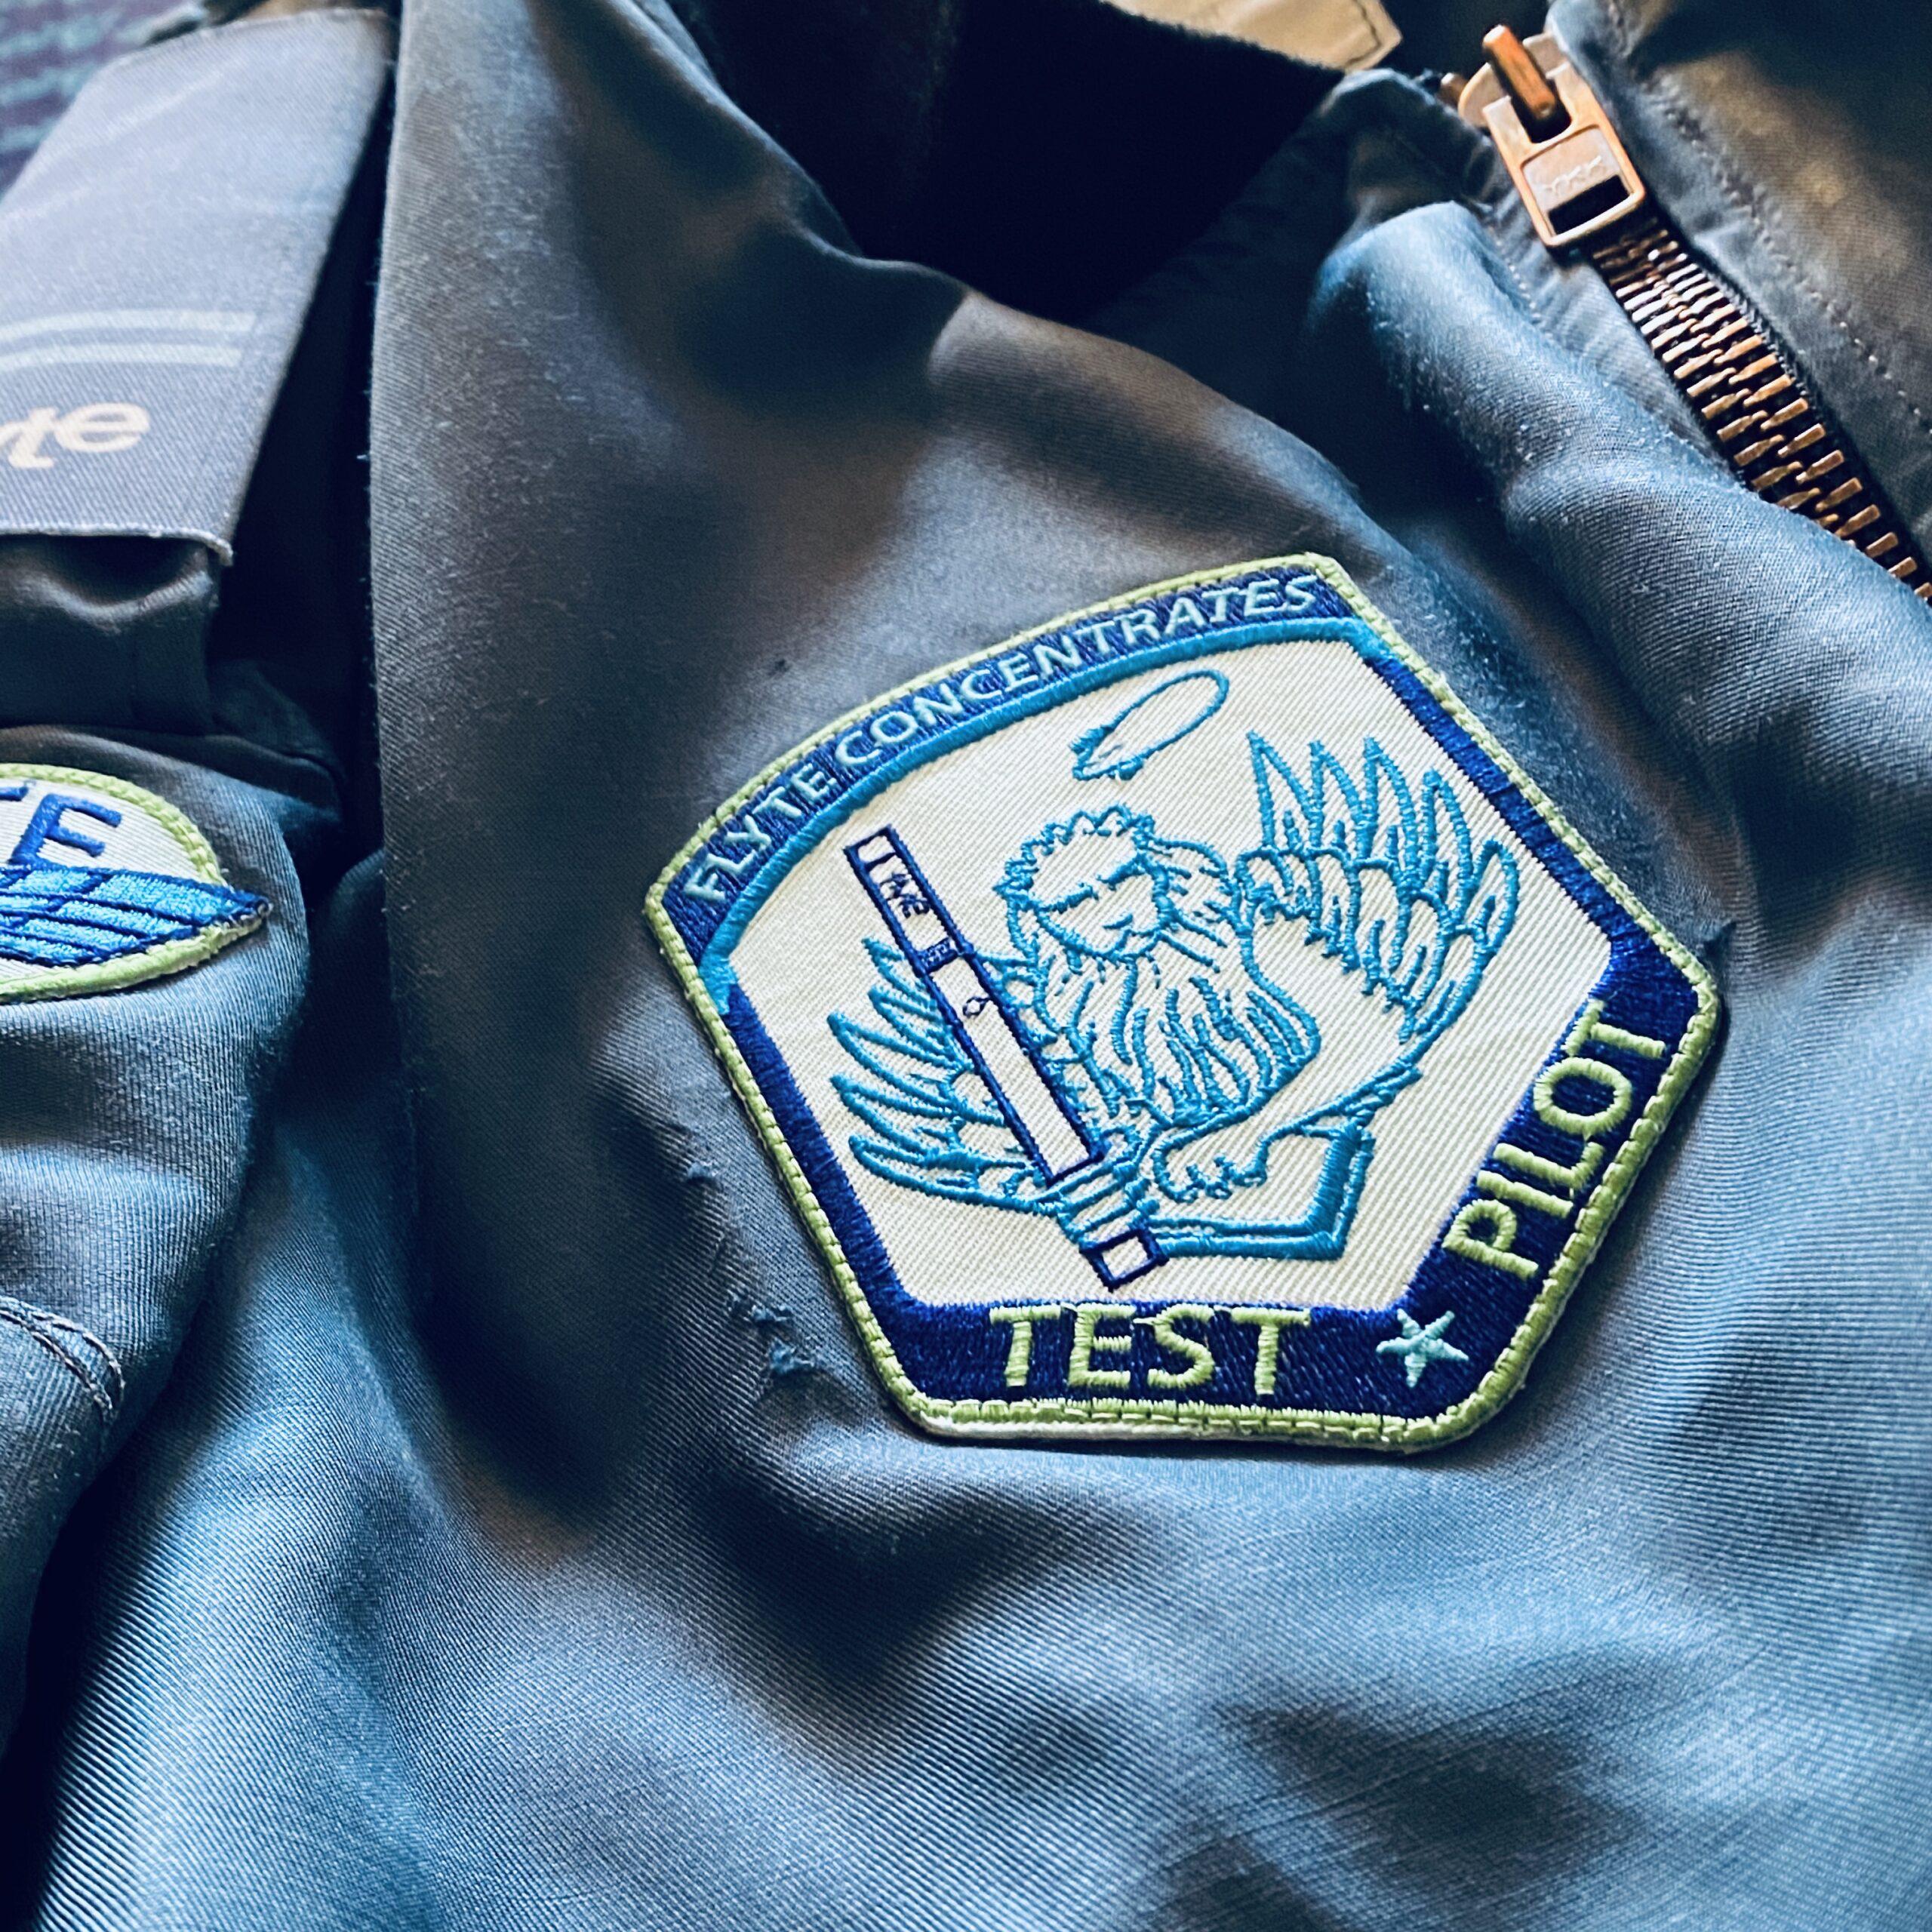 Flyte test pilot patch on genuine issue RCAF flight jacket.